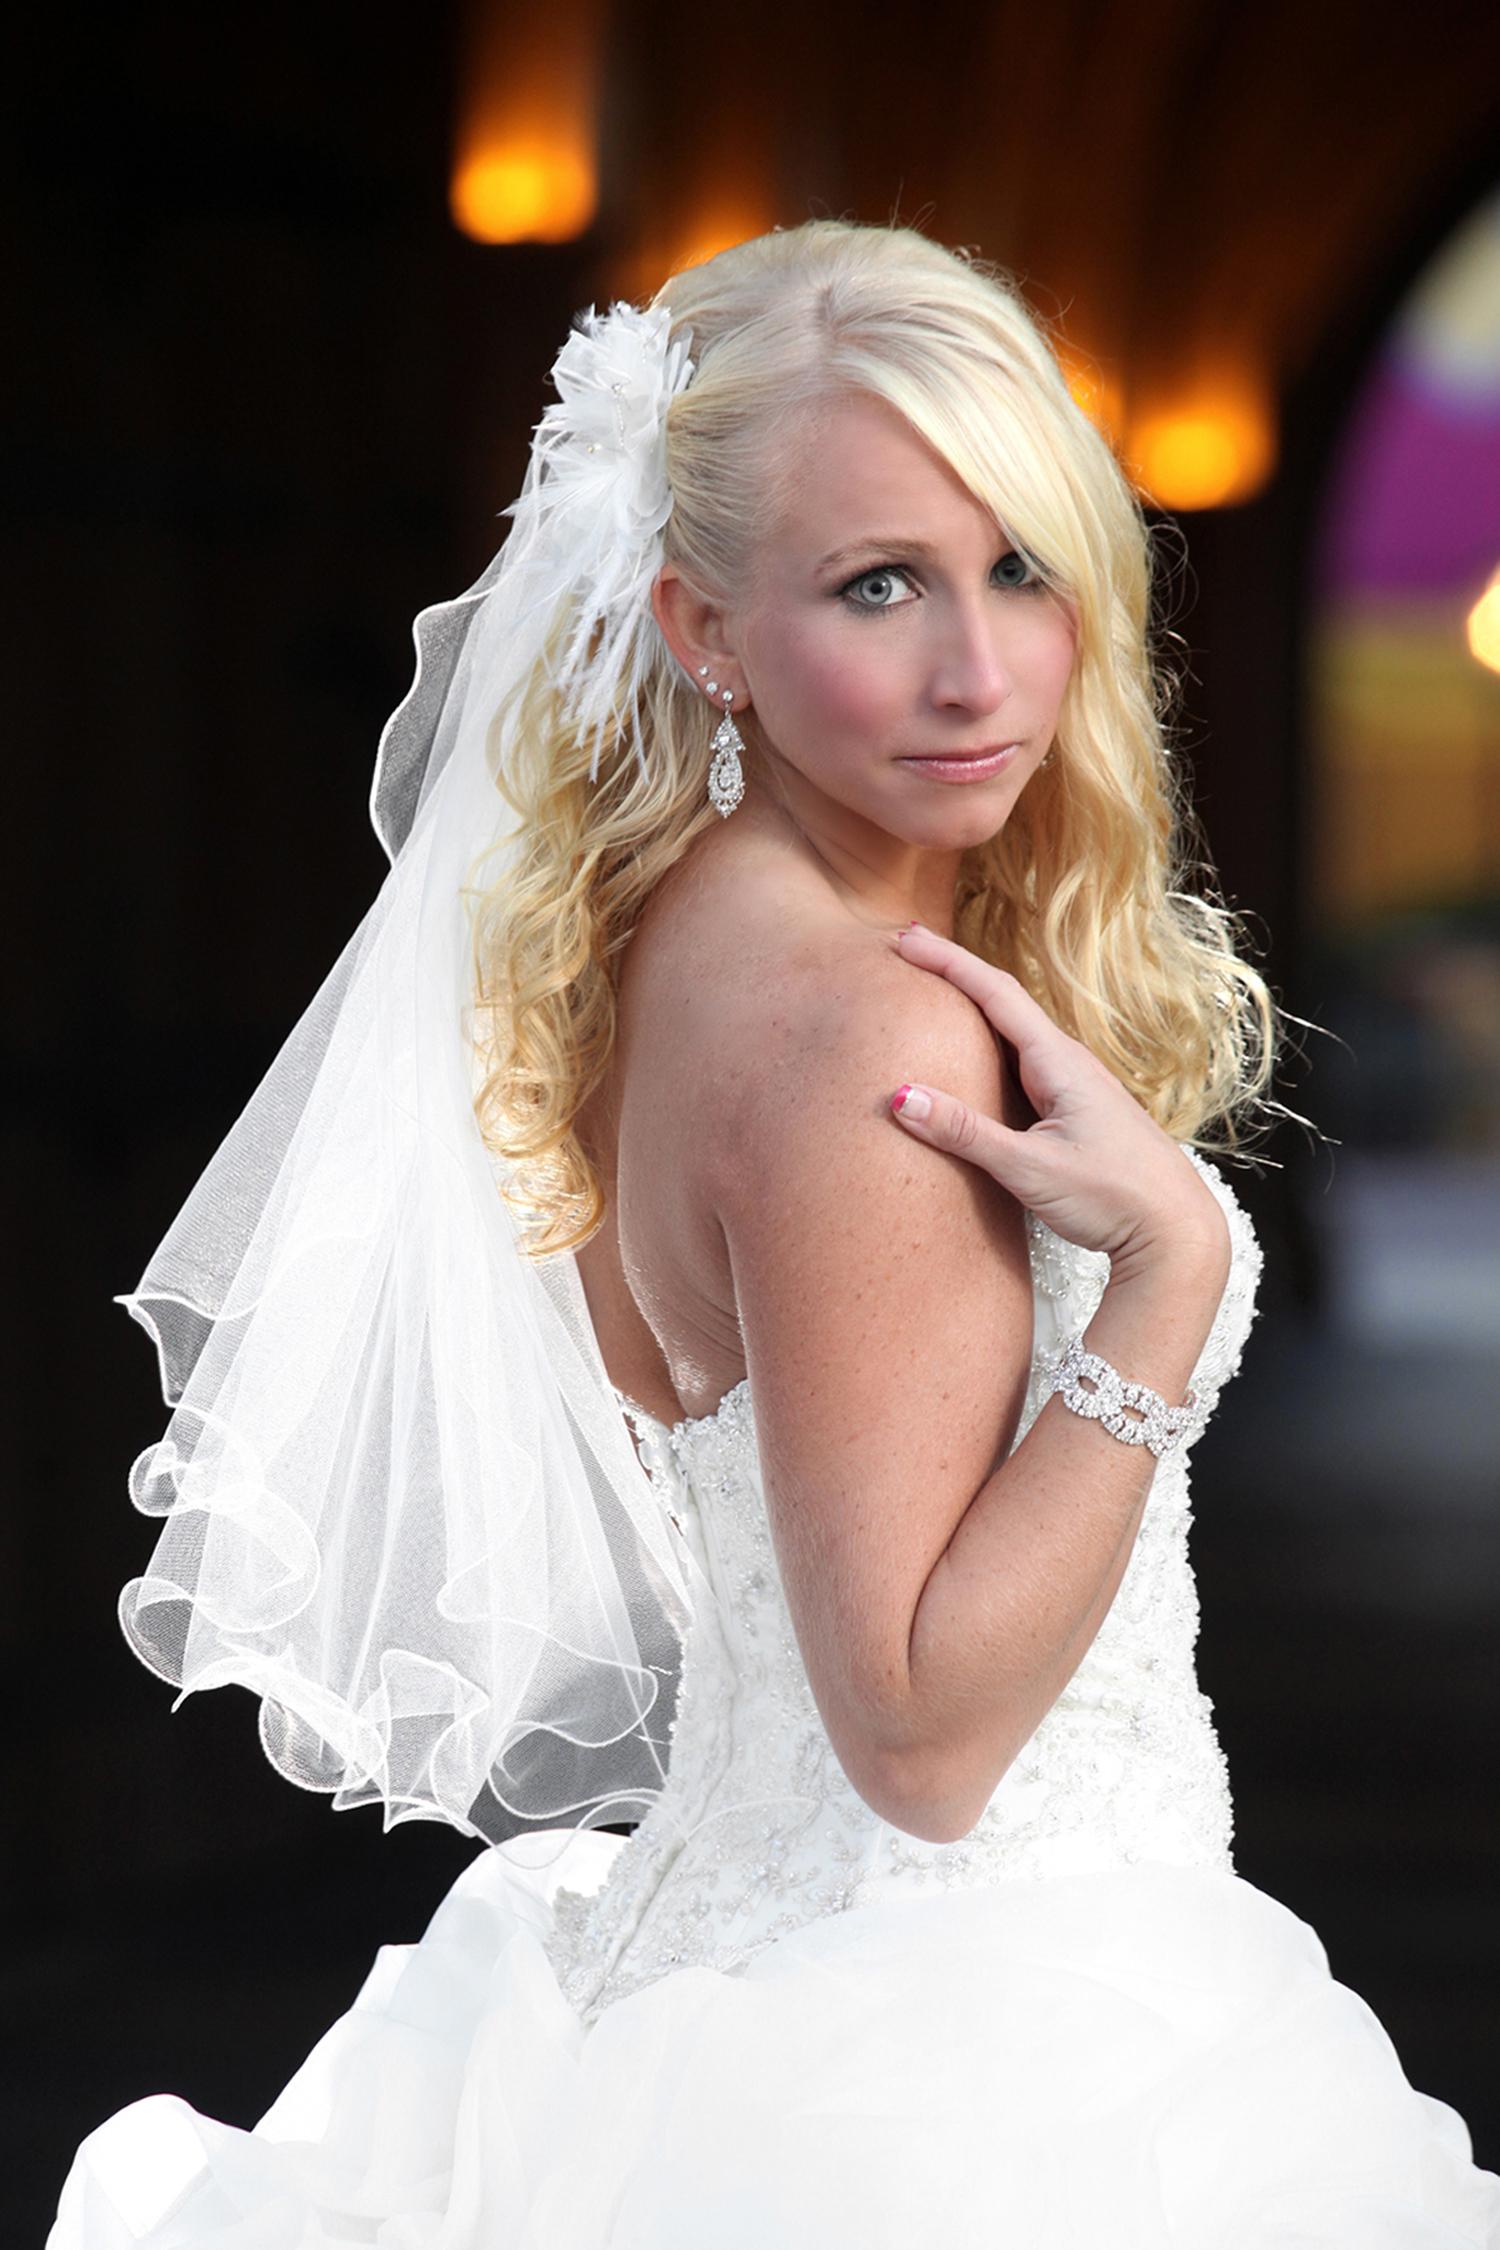 Rick-Ferro-Bridal-Over-Shoulder-Portrait.jpg